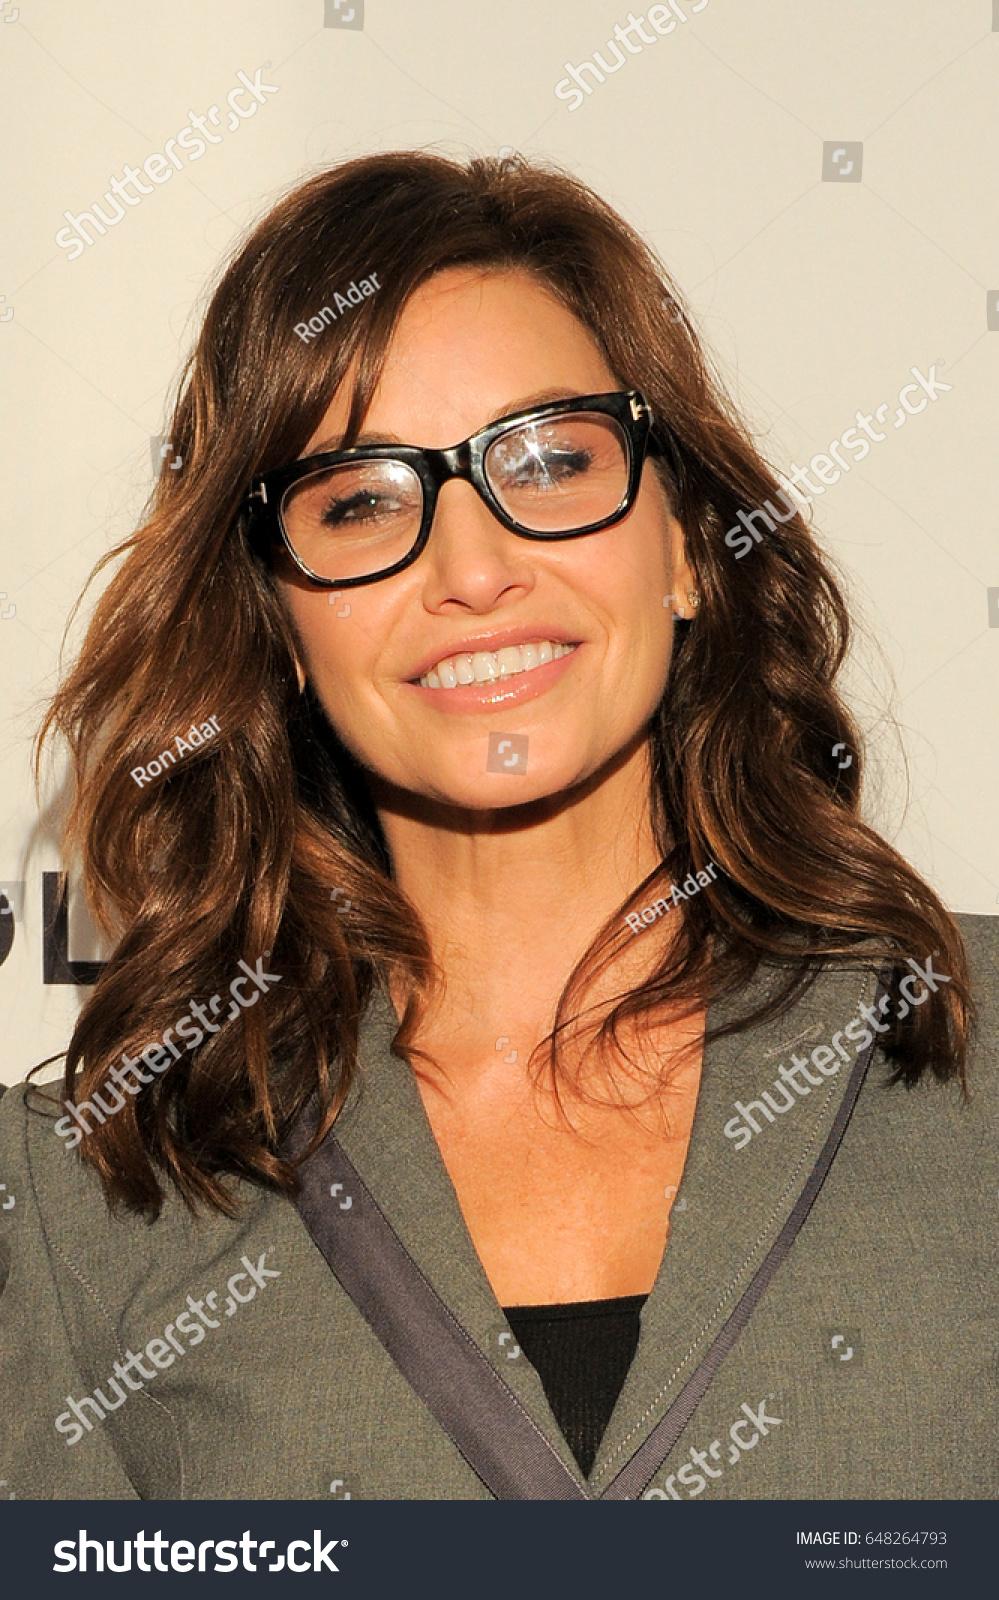 pics Gina gershon permission screening at tribeca film festival